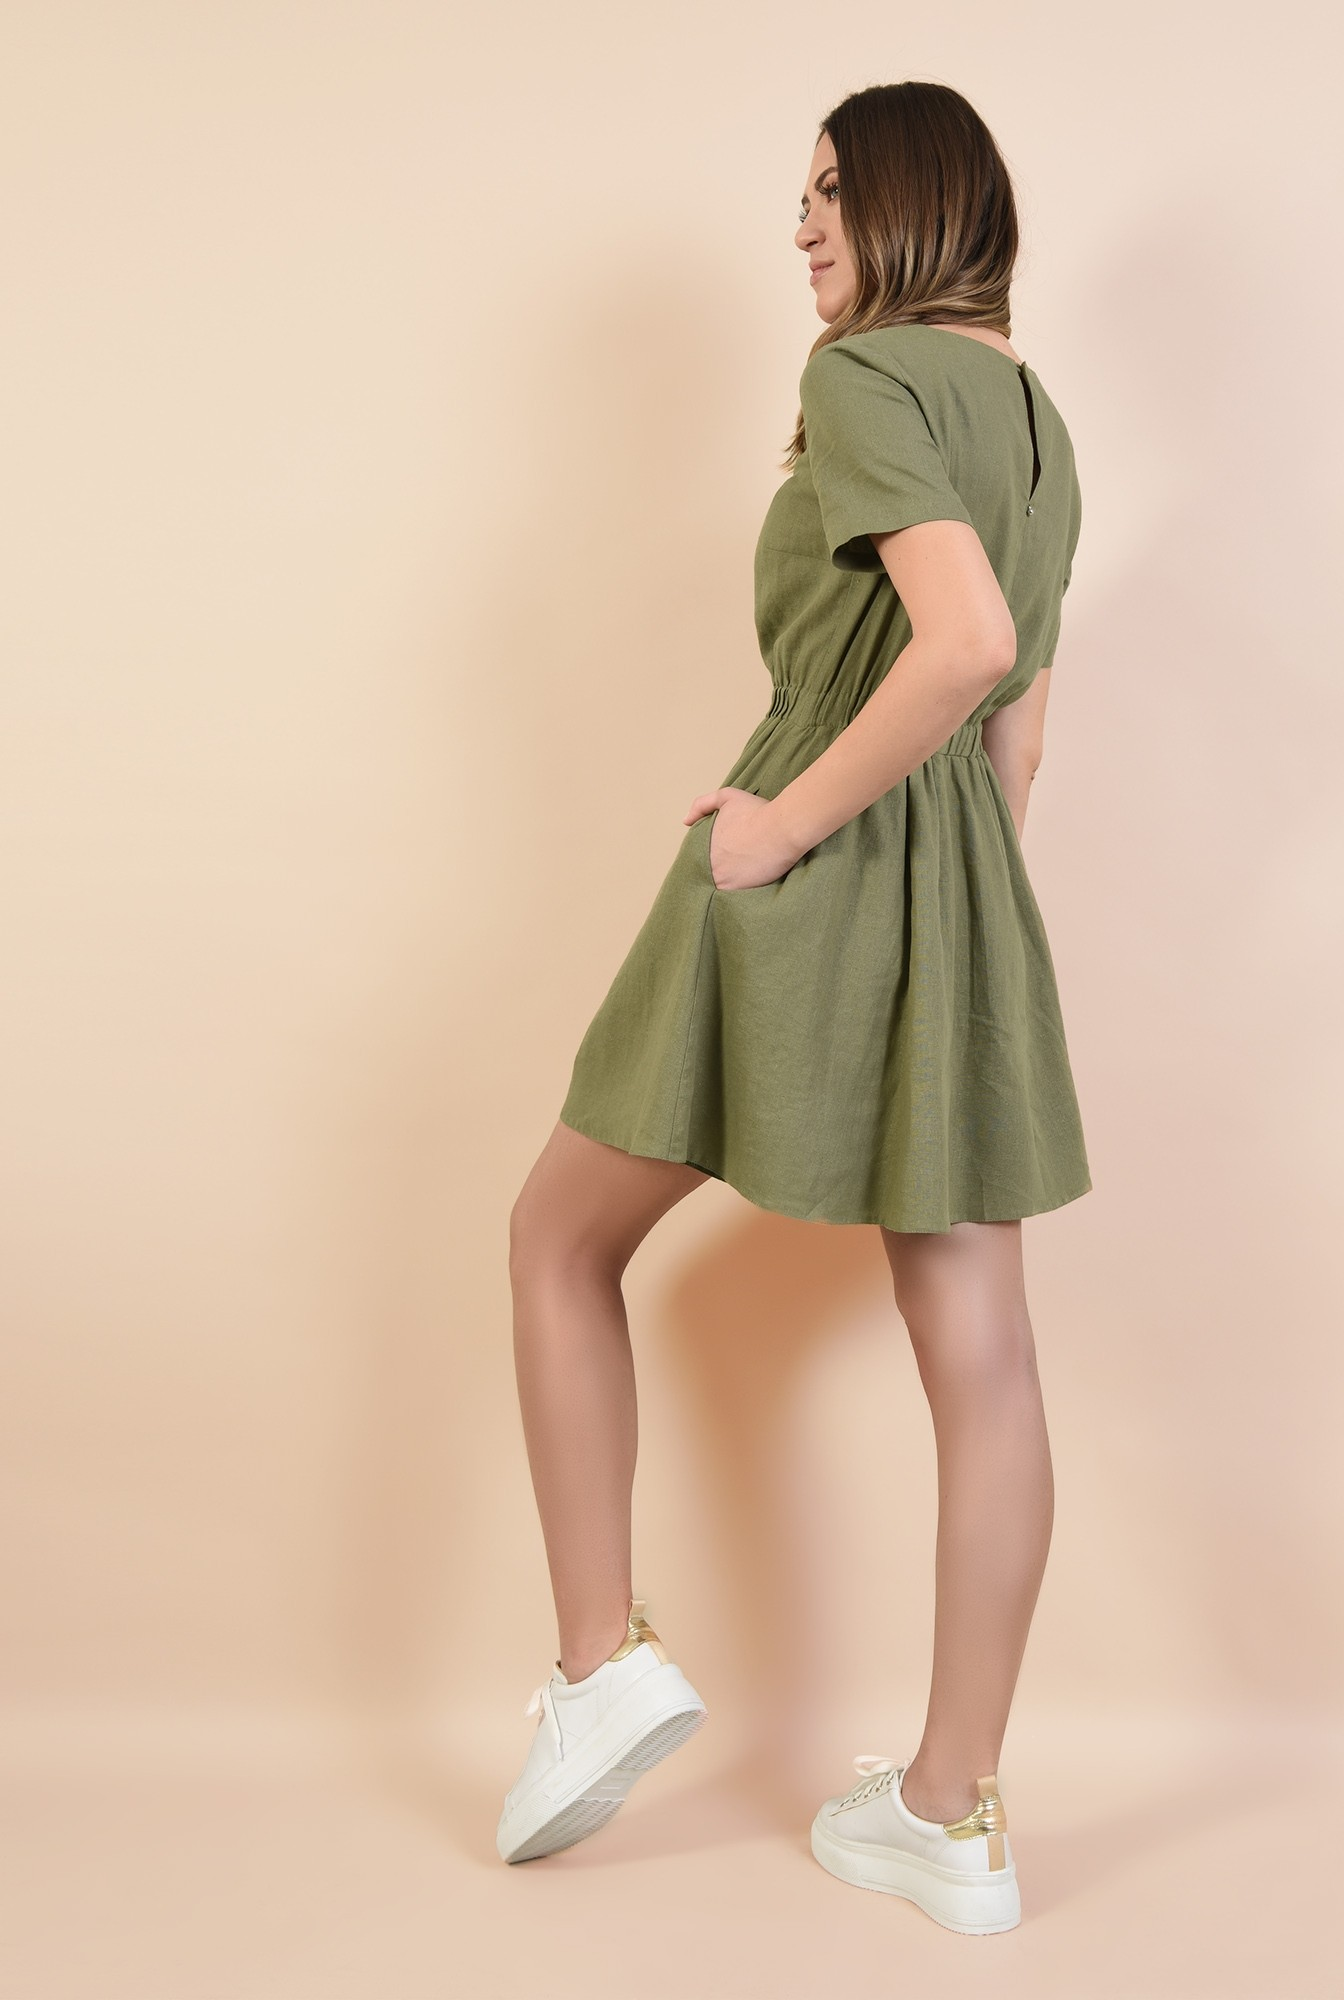 1 - 360 - rochie scurta, croi pe bie, decolteu rotund la baza gatului